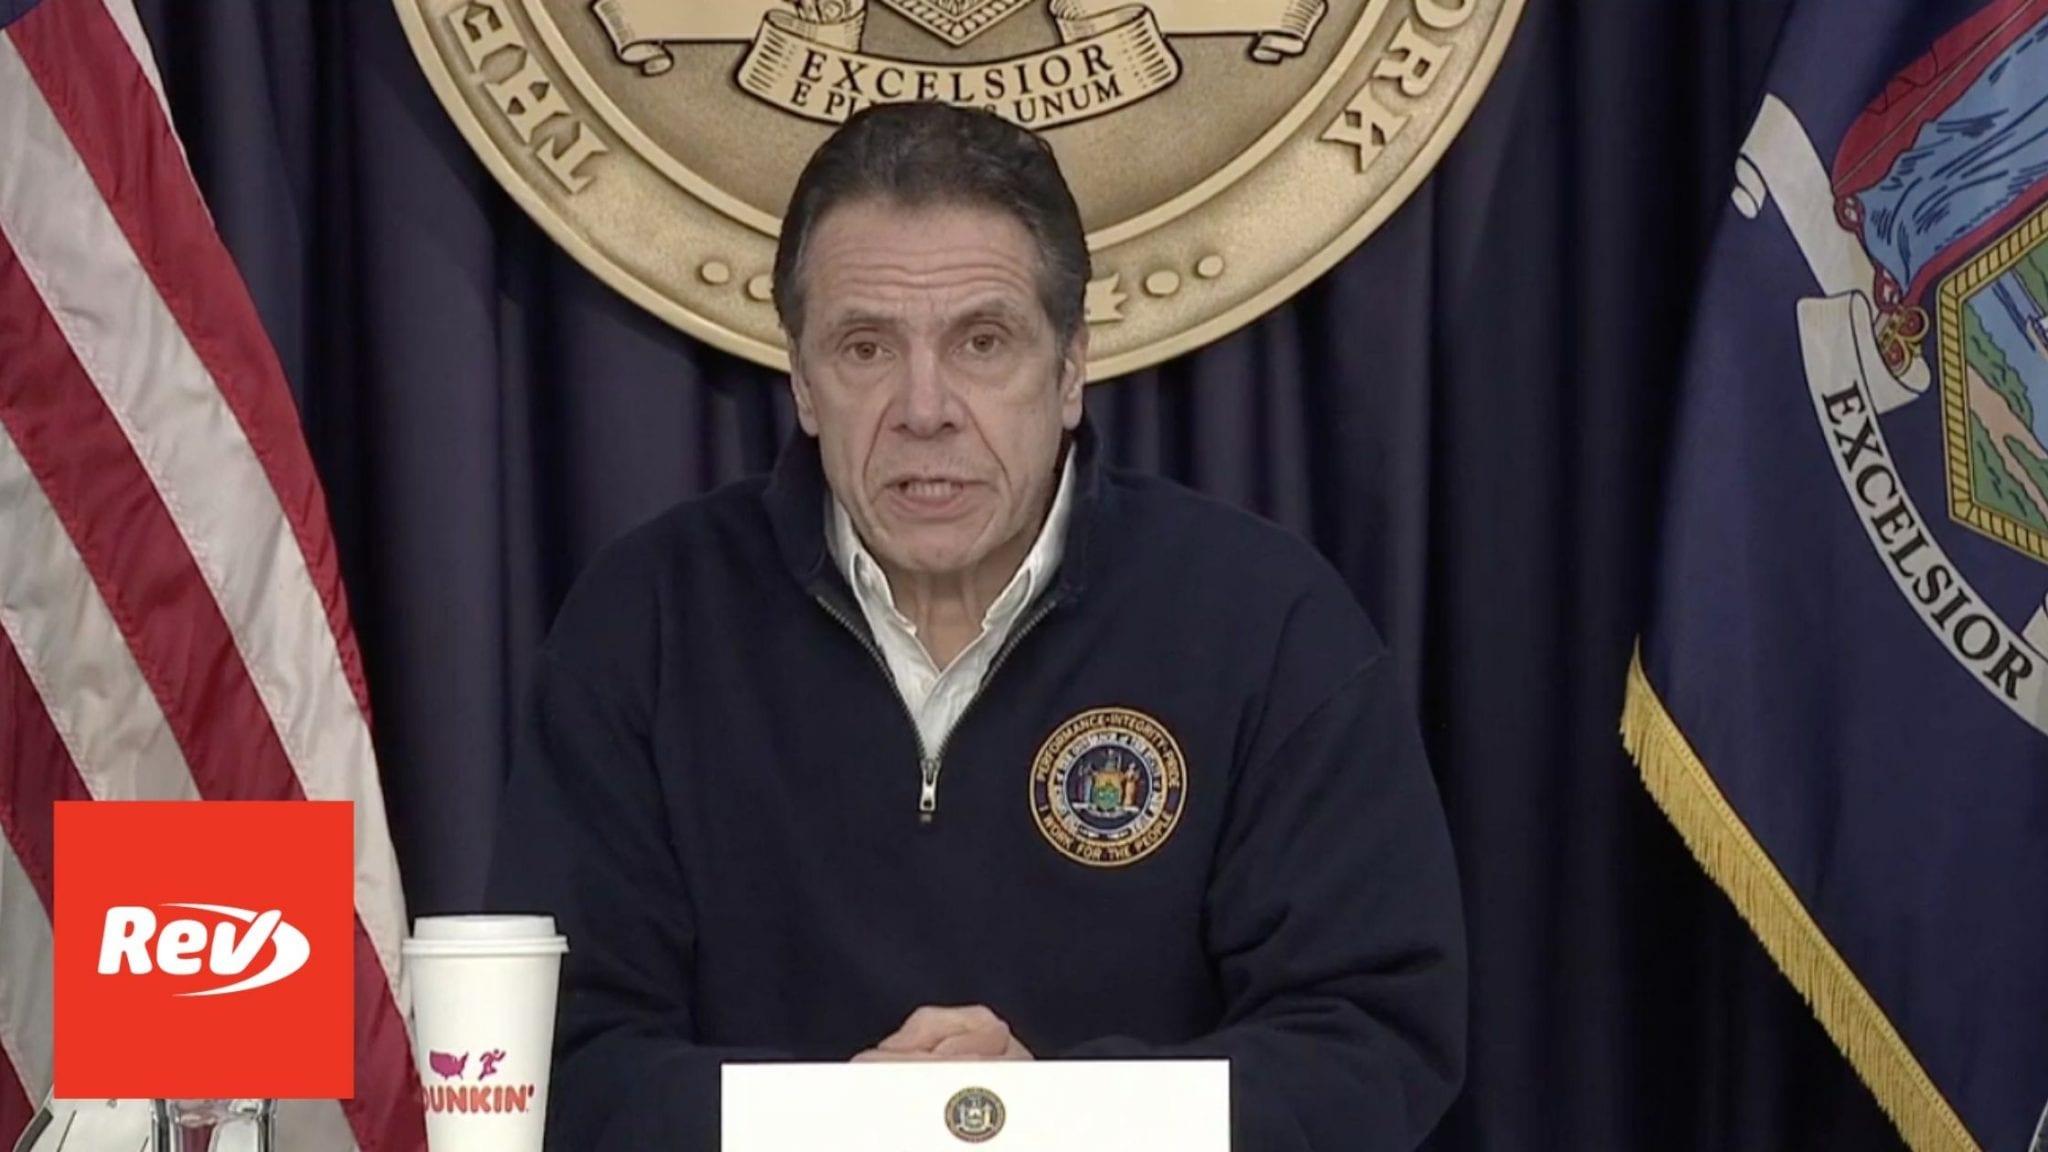 New York Gov. Andrew Cuomo Storm Press Conference Transcript February 2